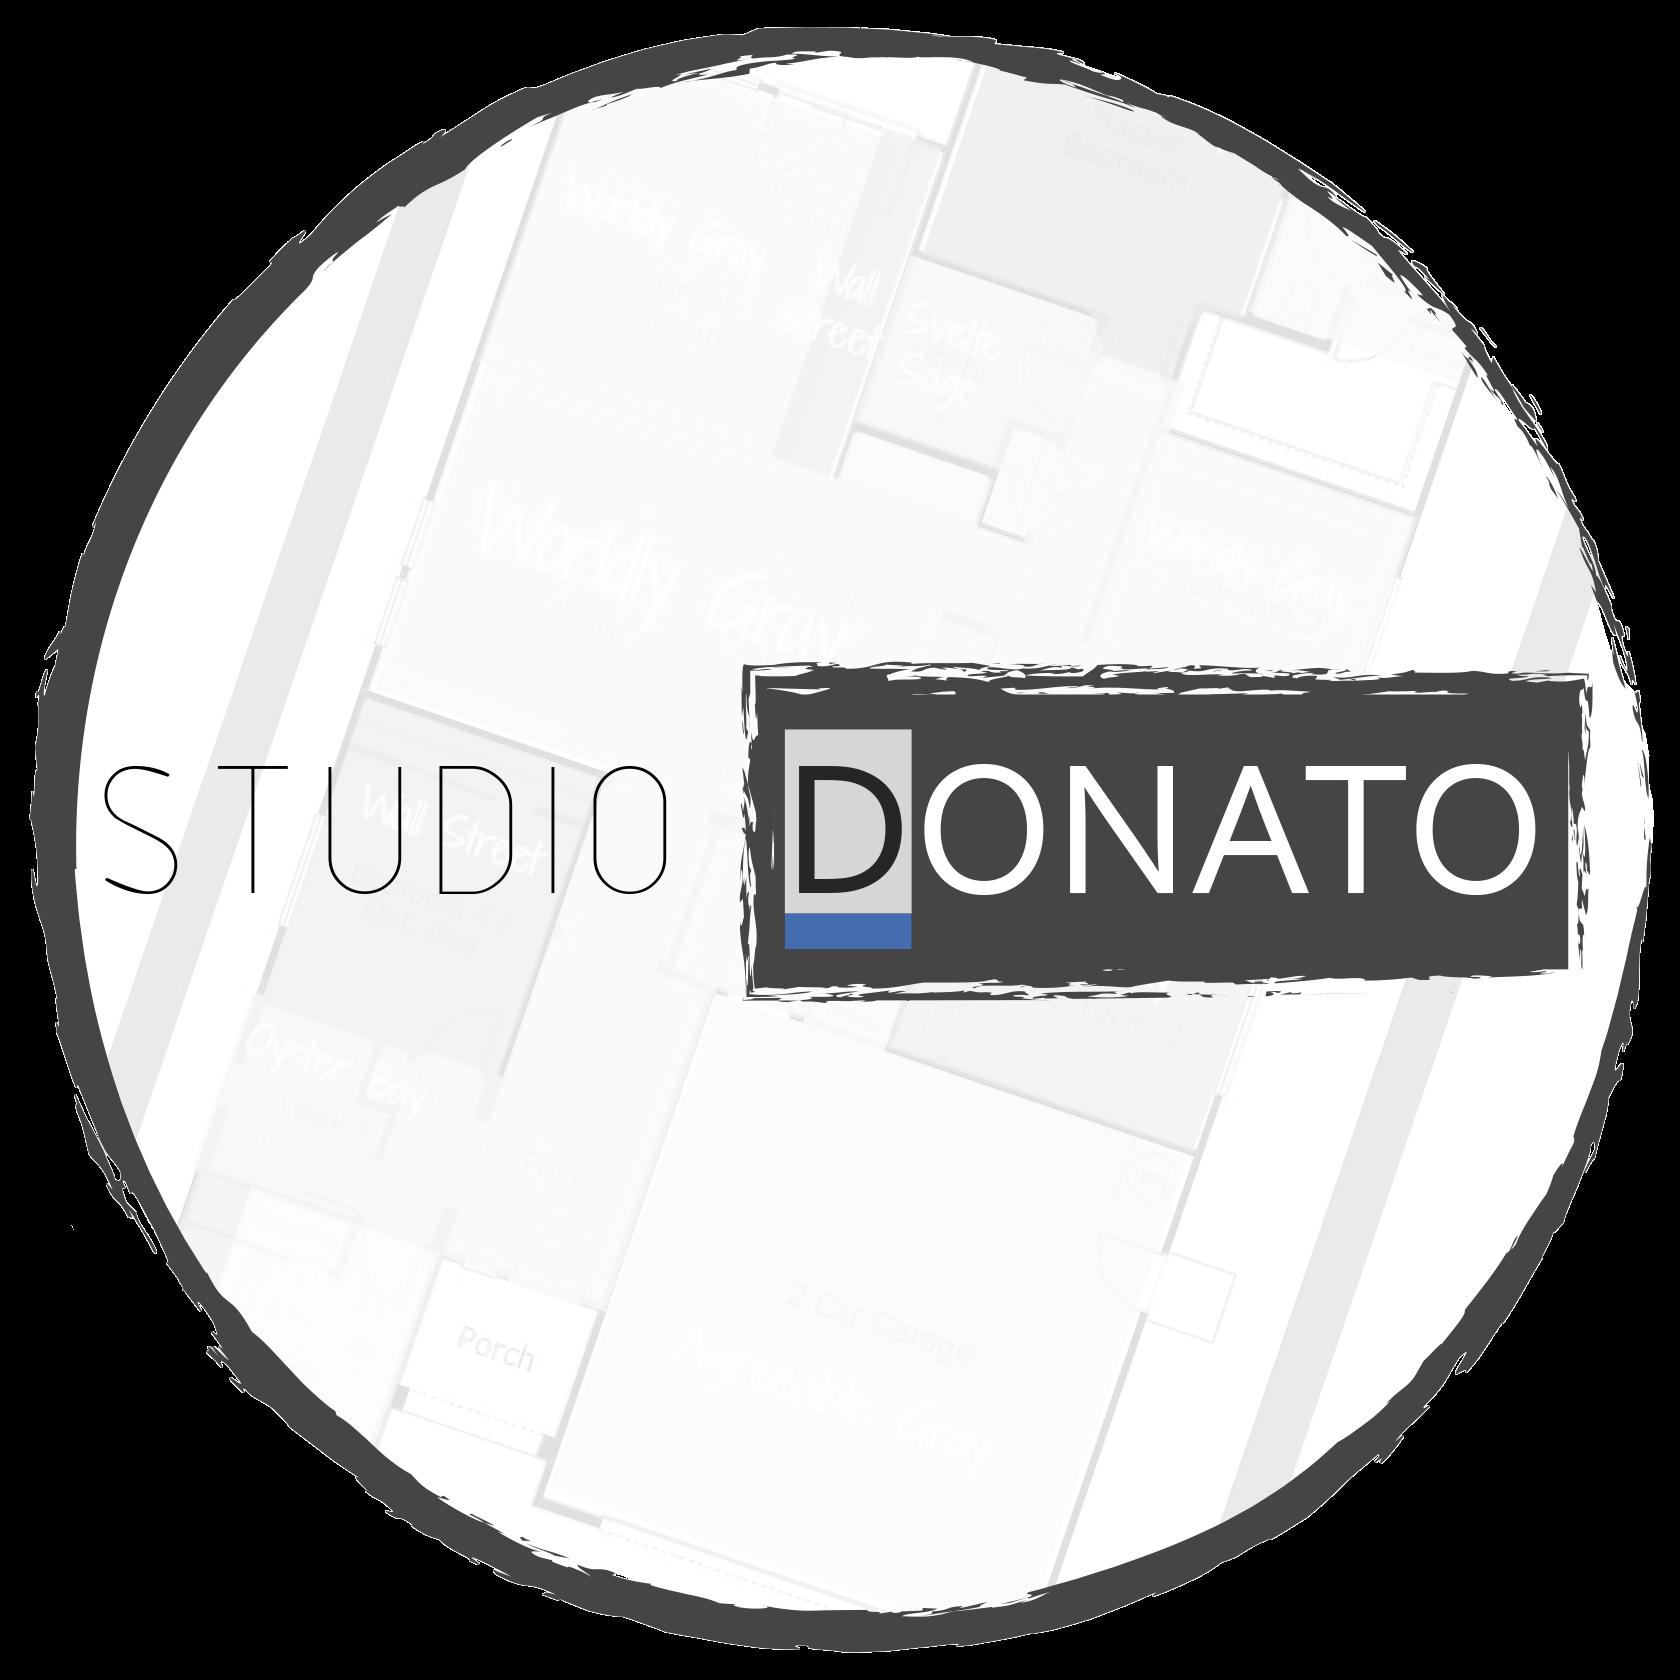 Studio Donato